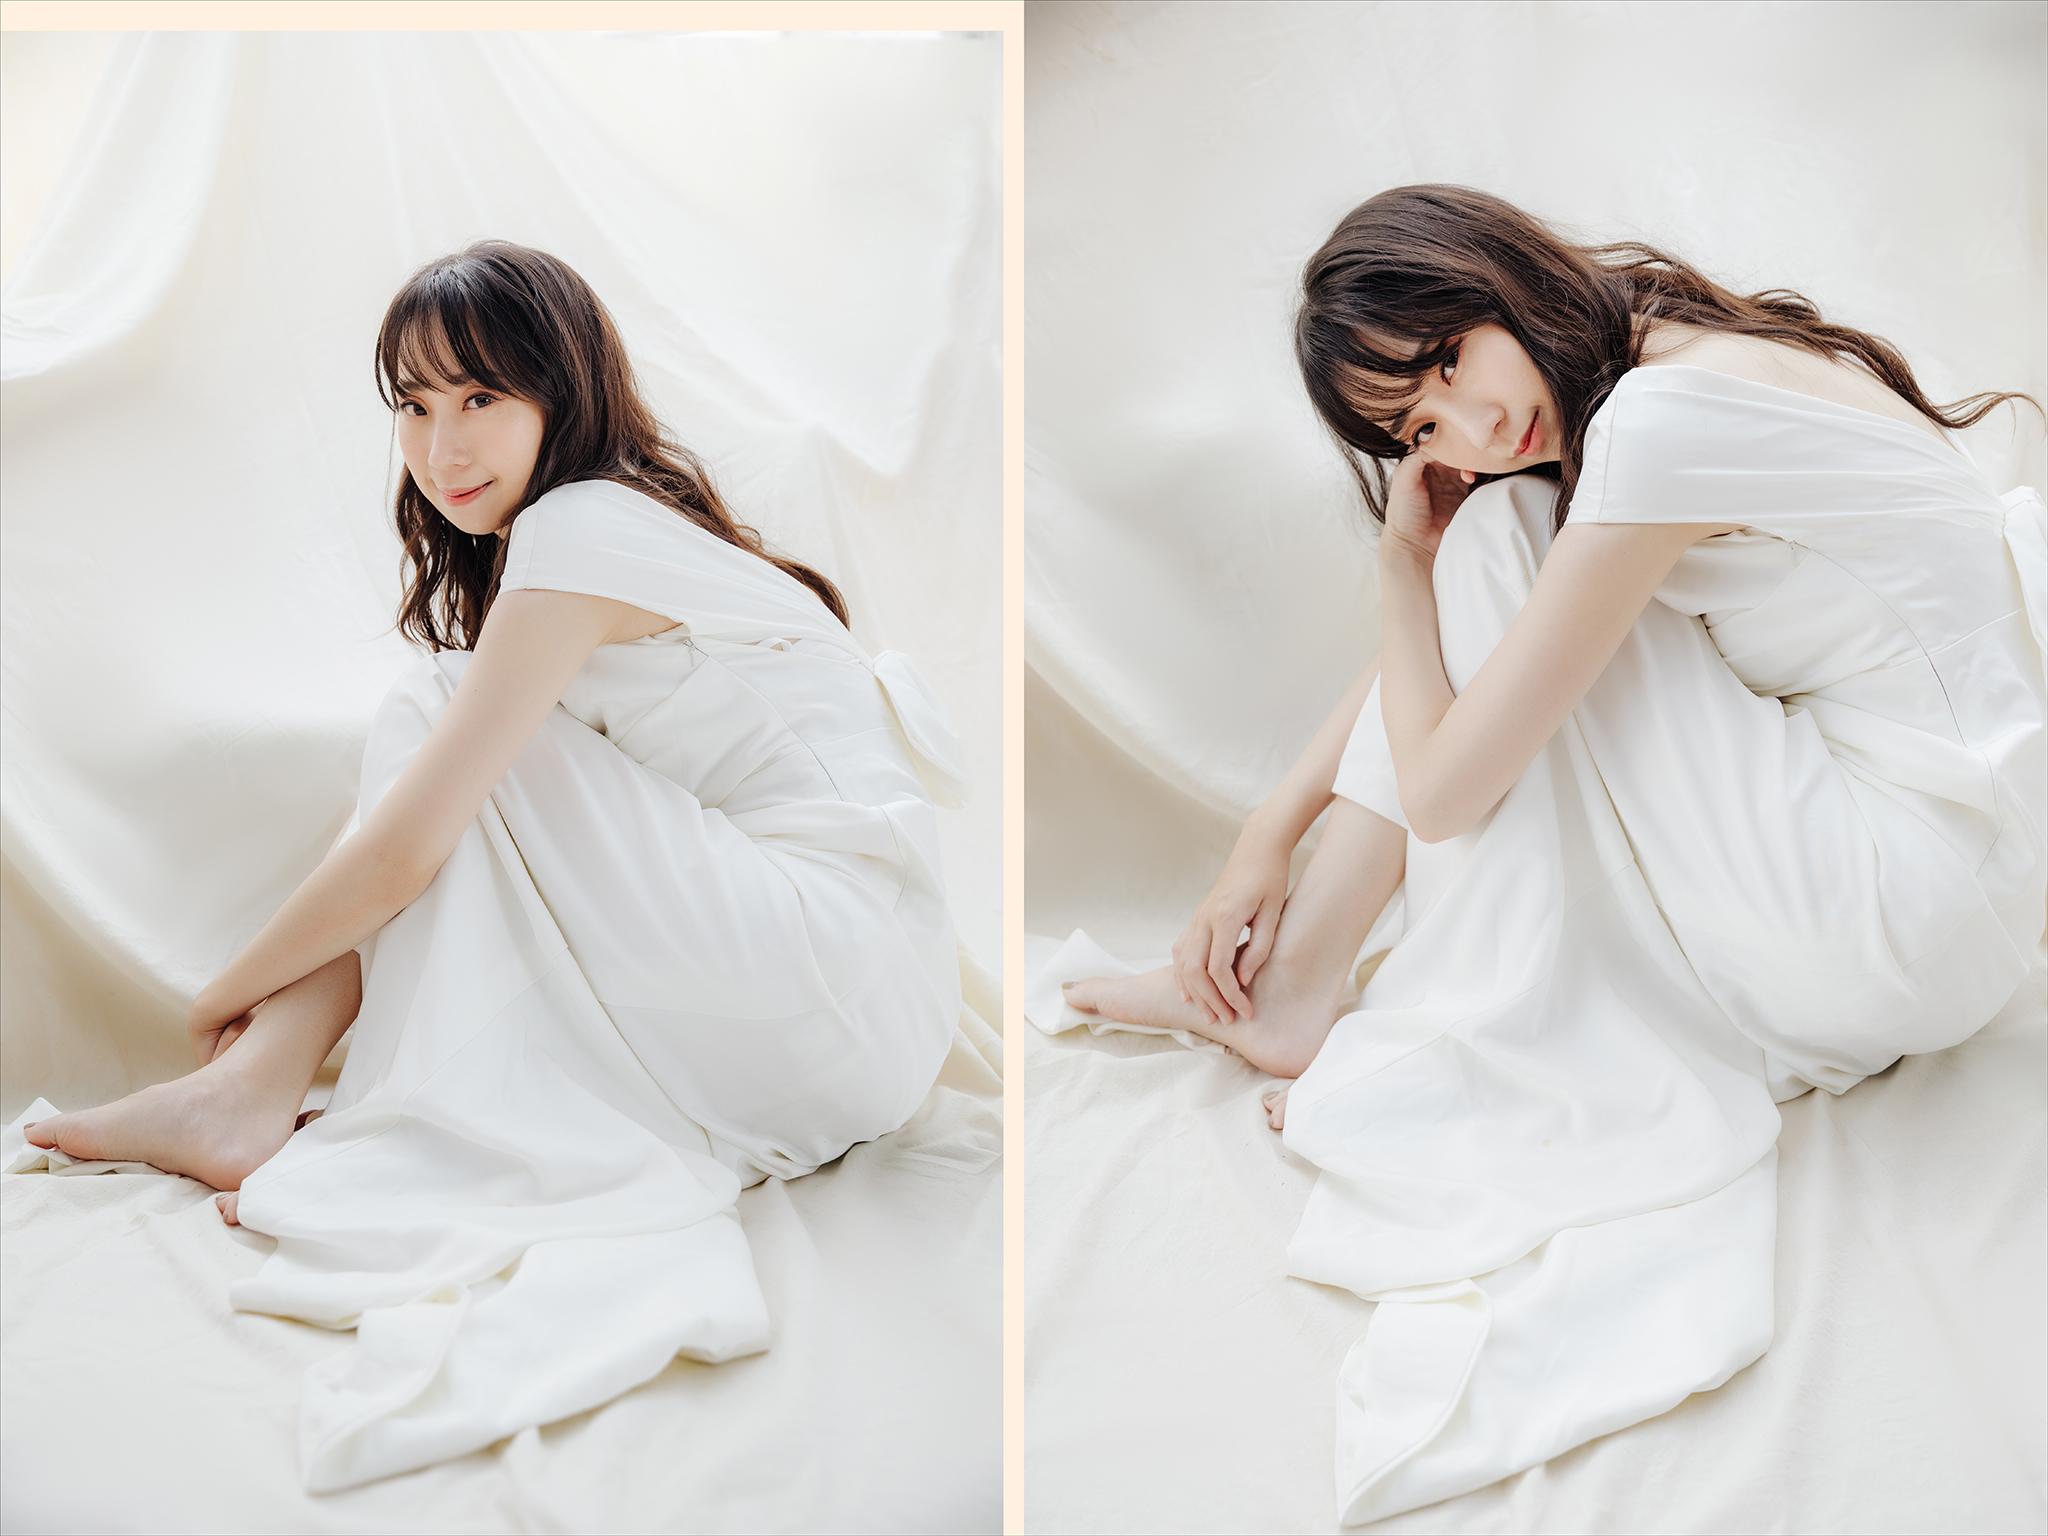 50659285383 d114803878 o - 【自主婚紗】+Melody+